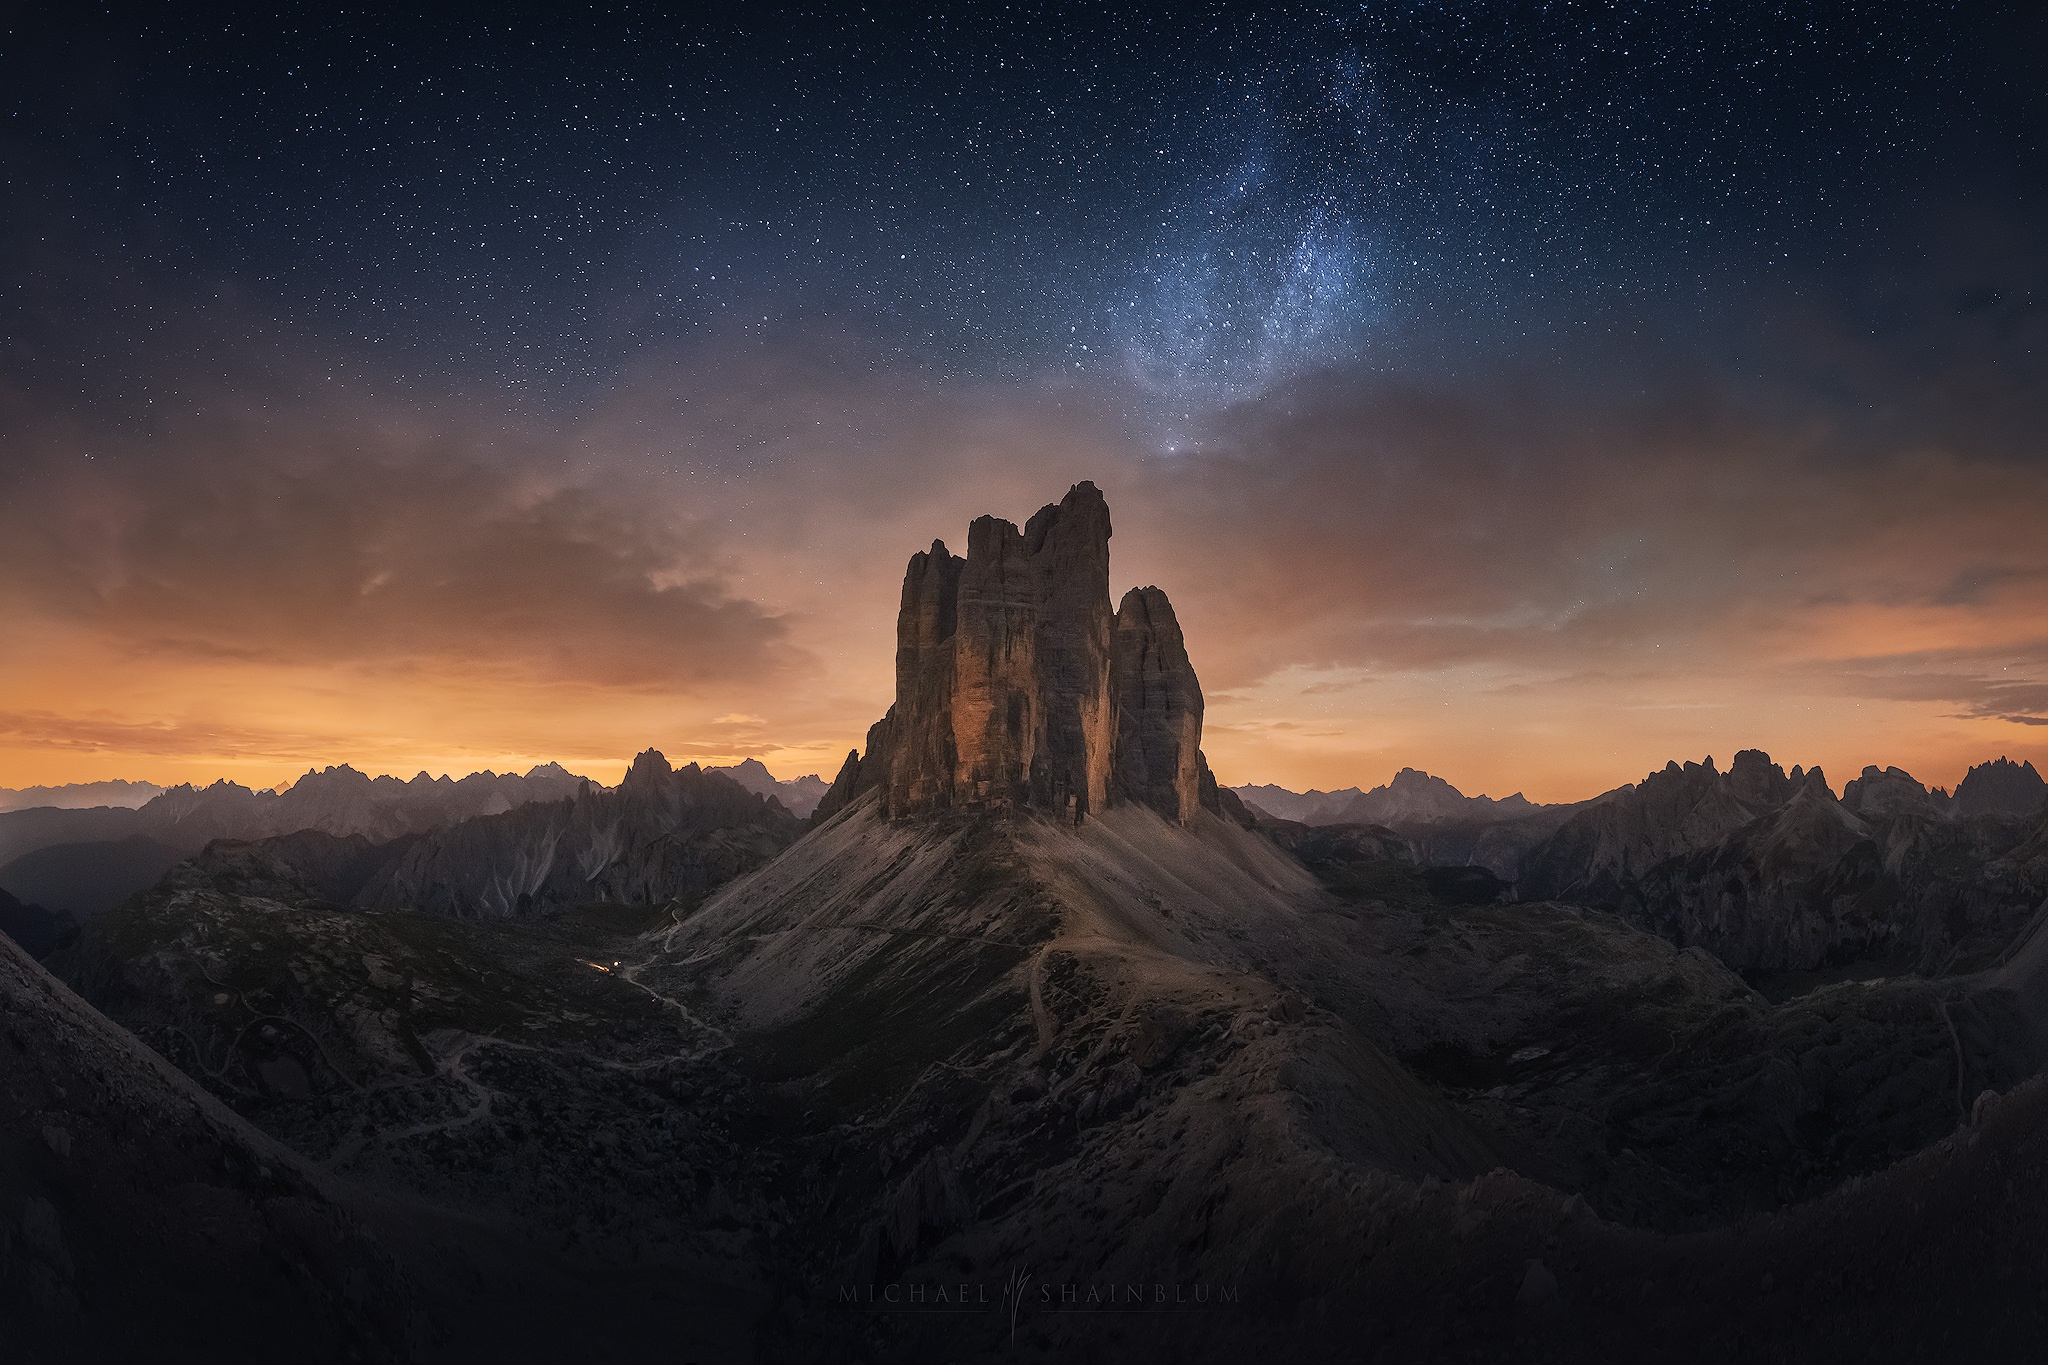 General 2048x1365 dark landscape sky nature night sky stars sunset photography Michael Shainblum